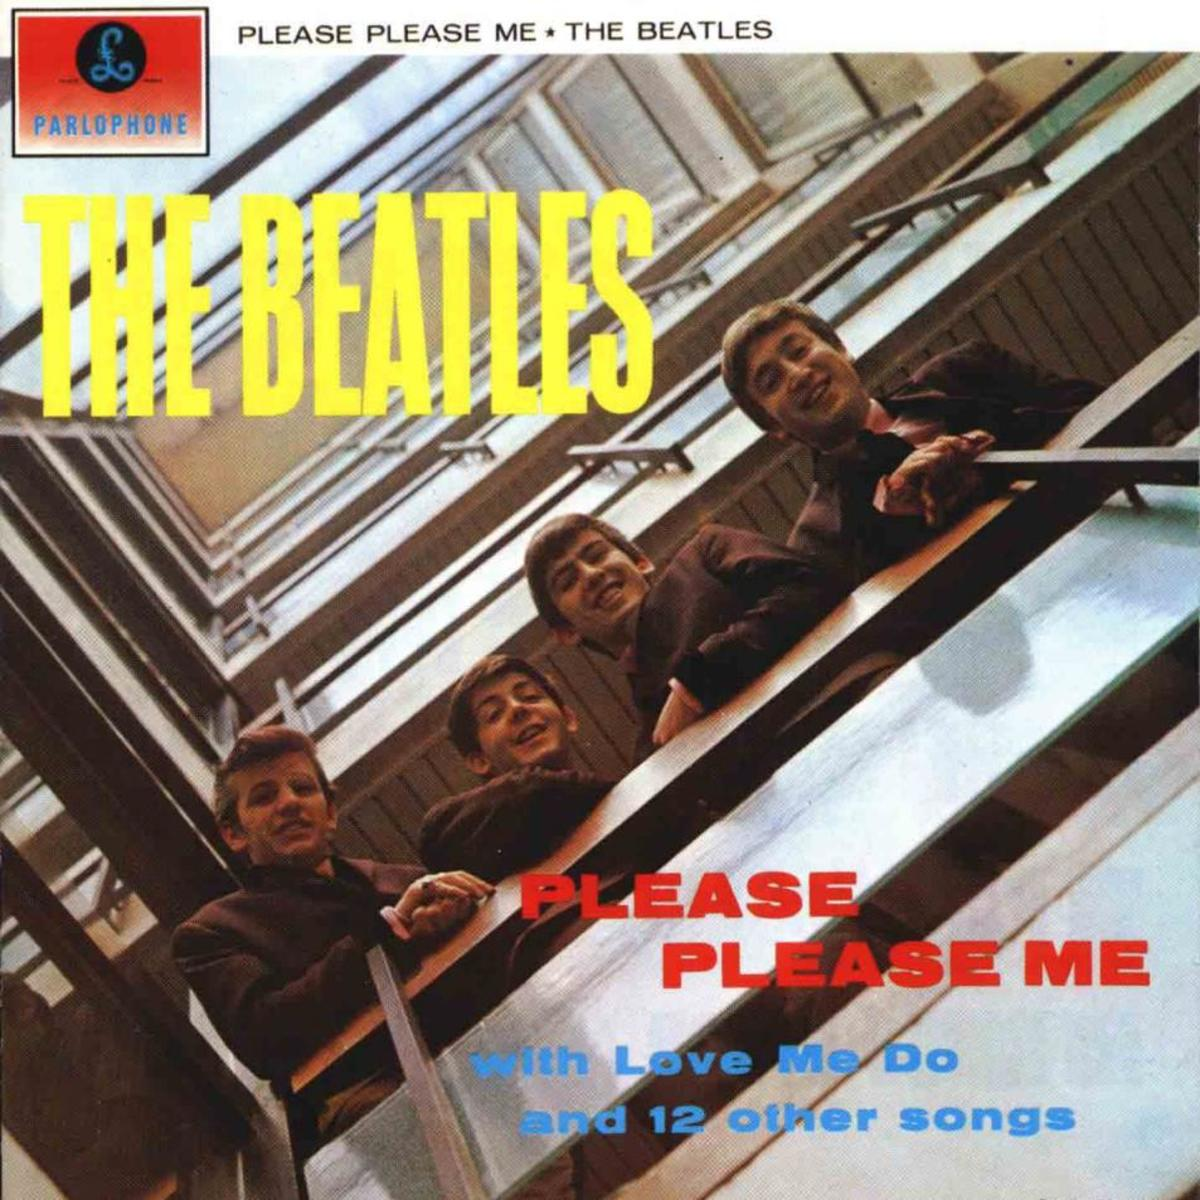 the-beatles-please-please-me-album